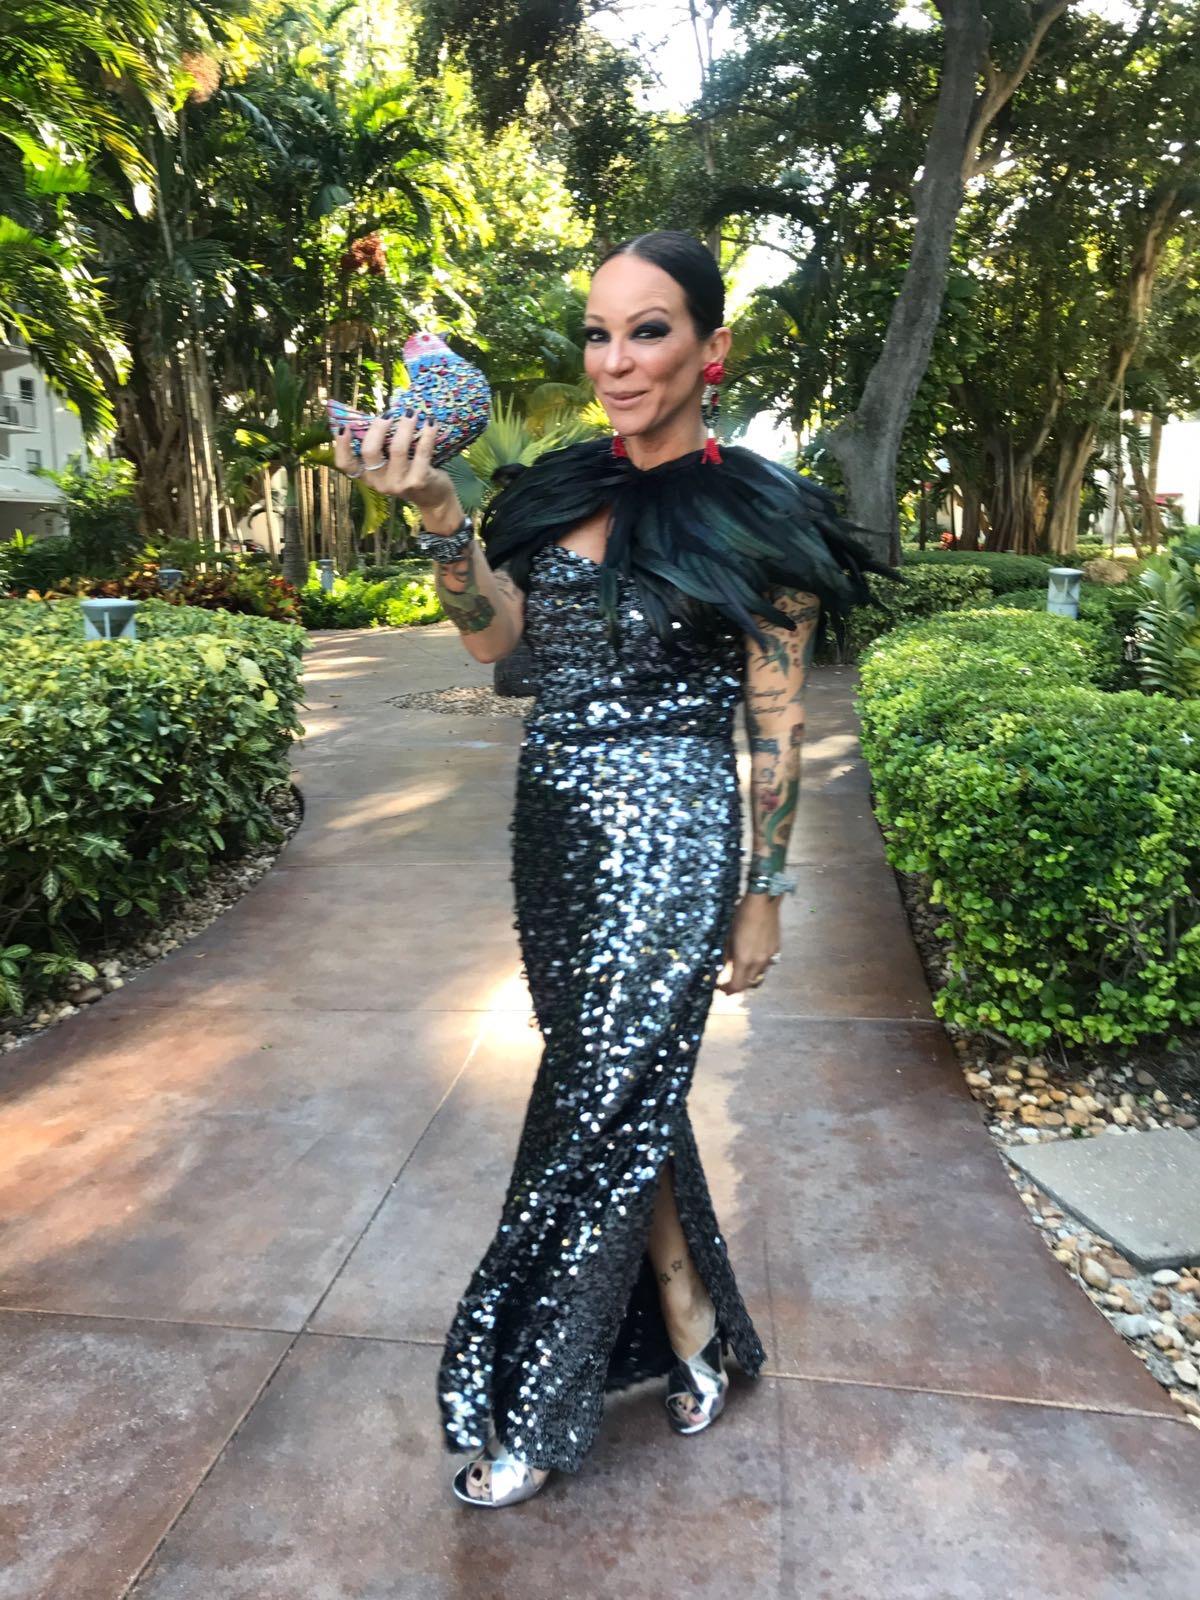 Carla McCarthy in a shiny black feather dress